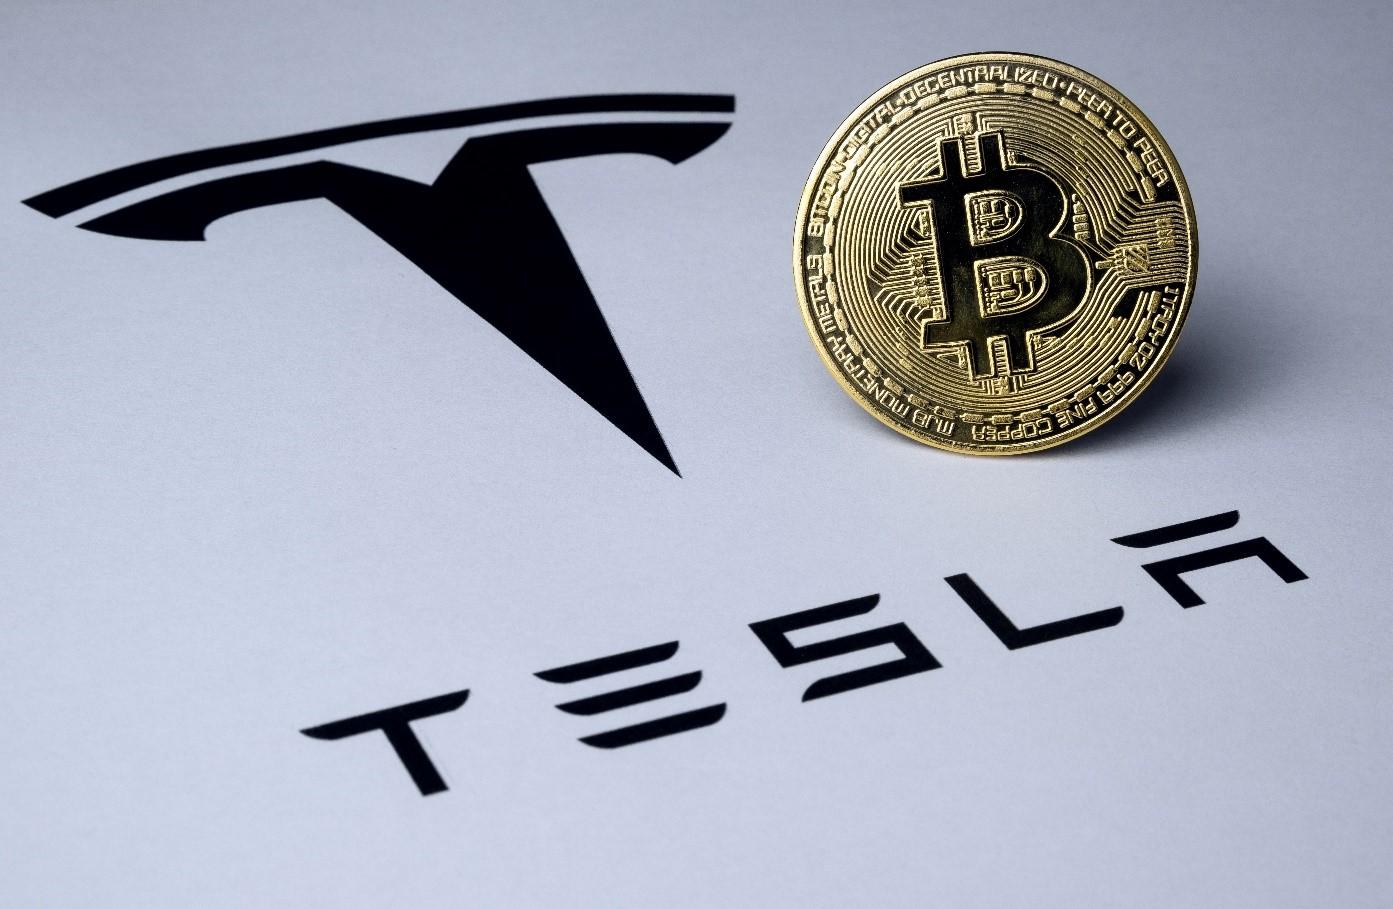 Tesla (TSLA) Reveals $1.5B Investment in Bitcoin